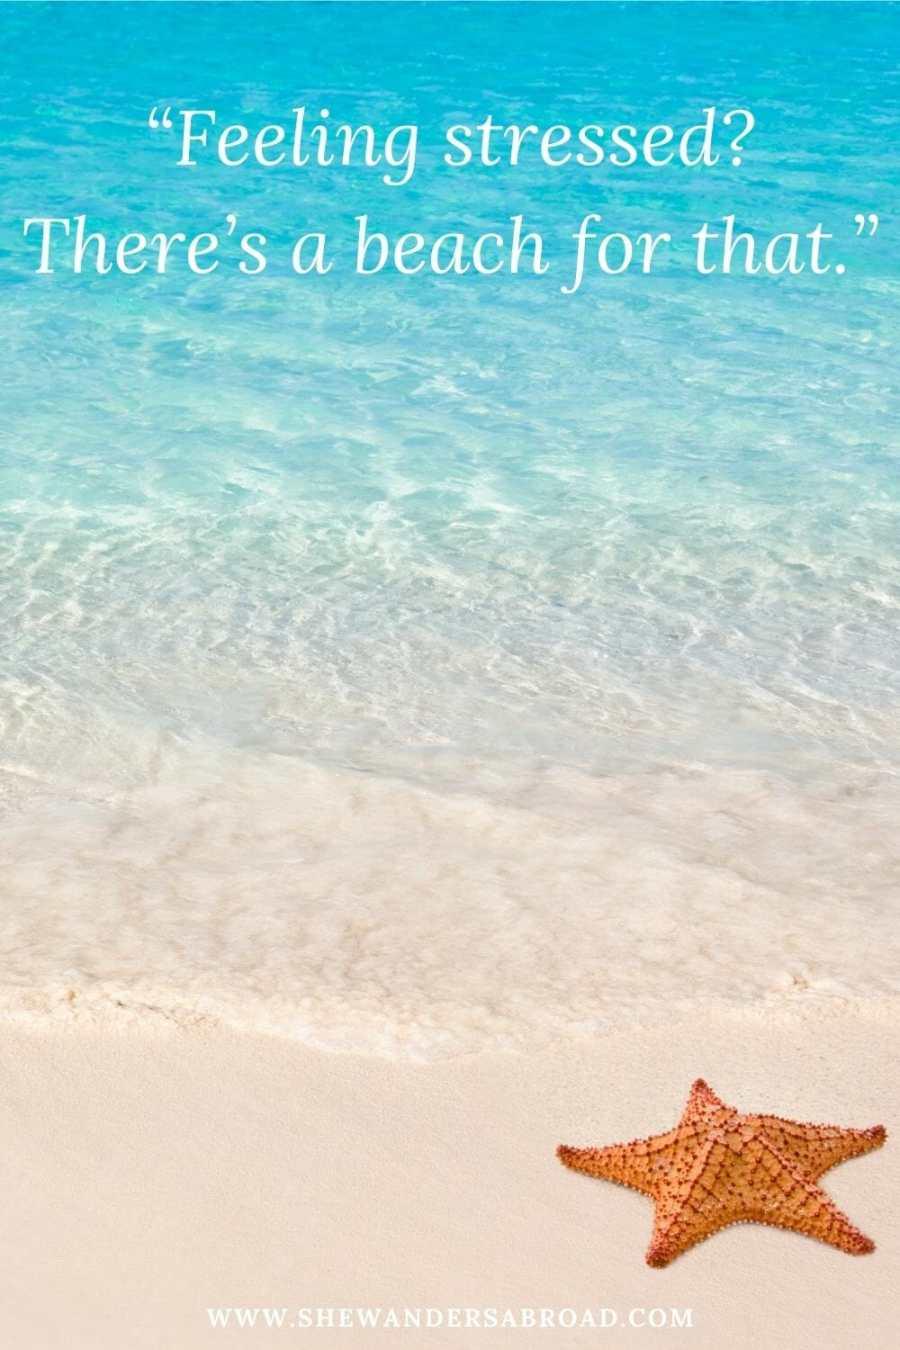 Short beach captions for Instagram